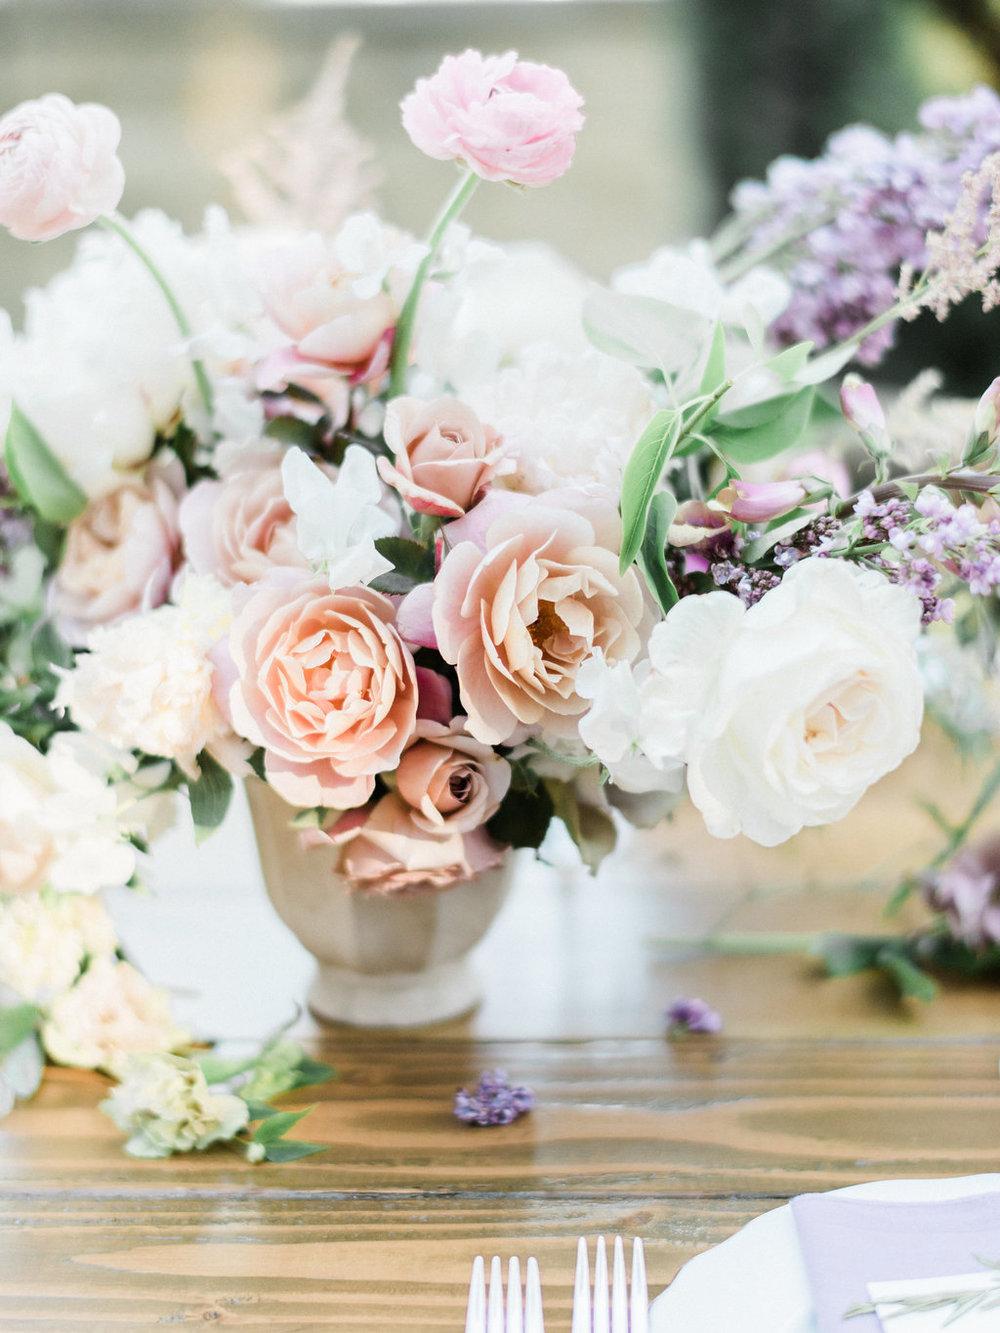 linajaandmichael-wedding-892.jpg